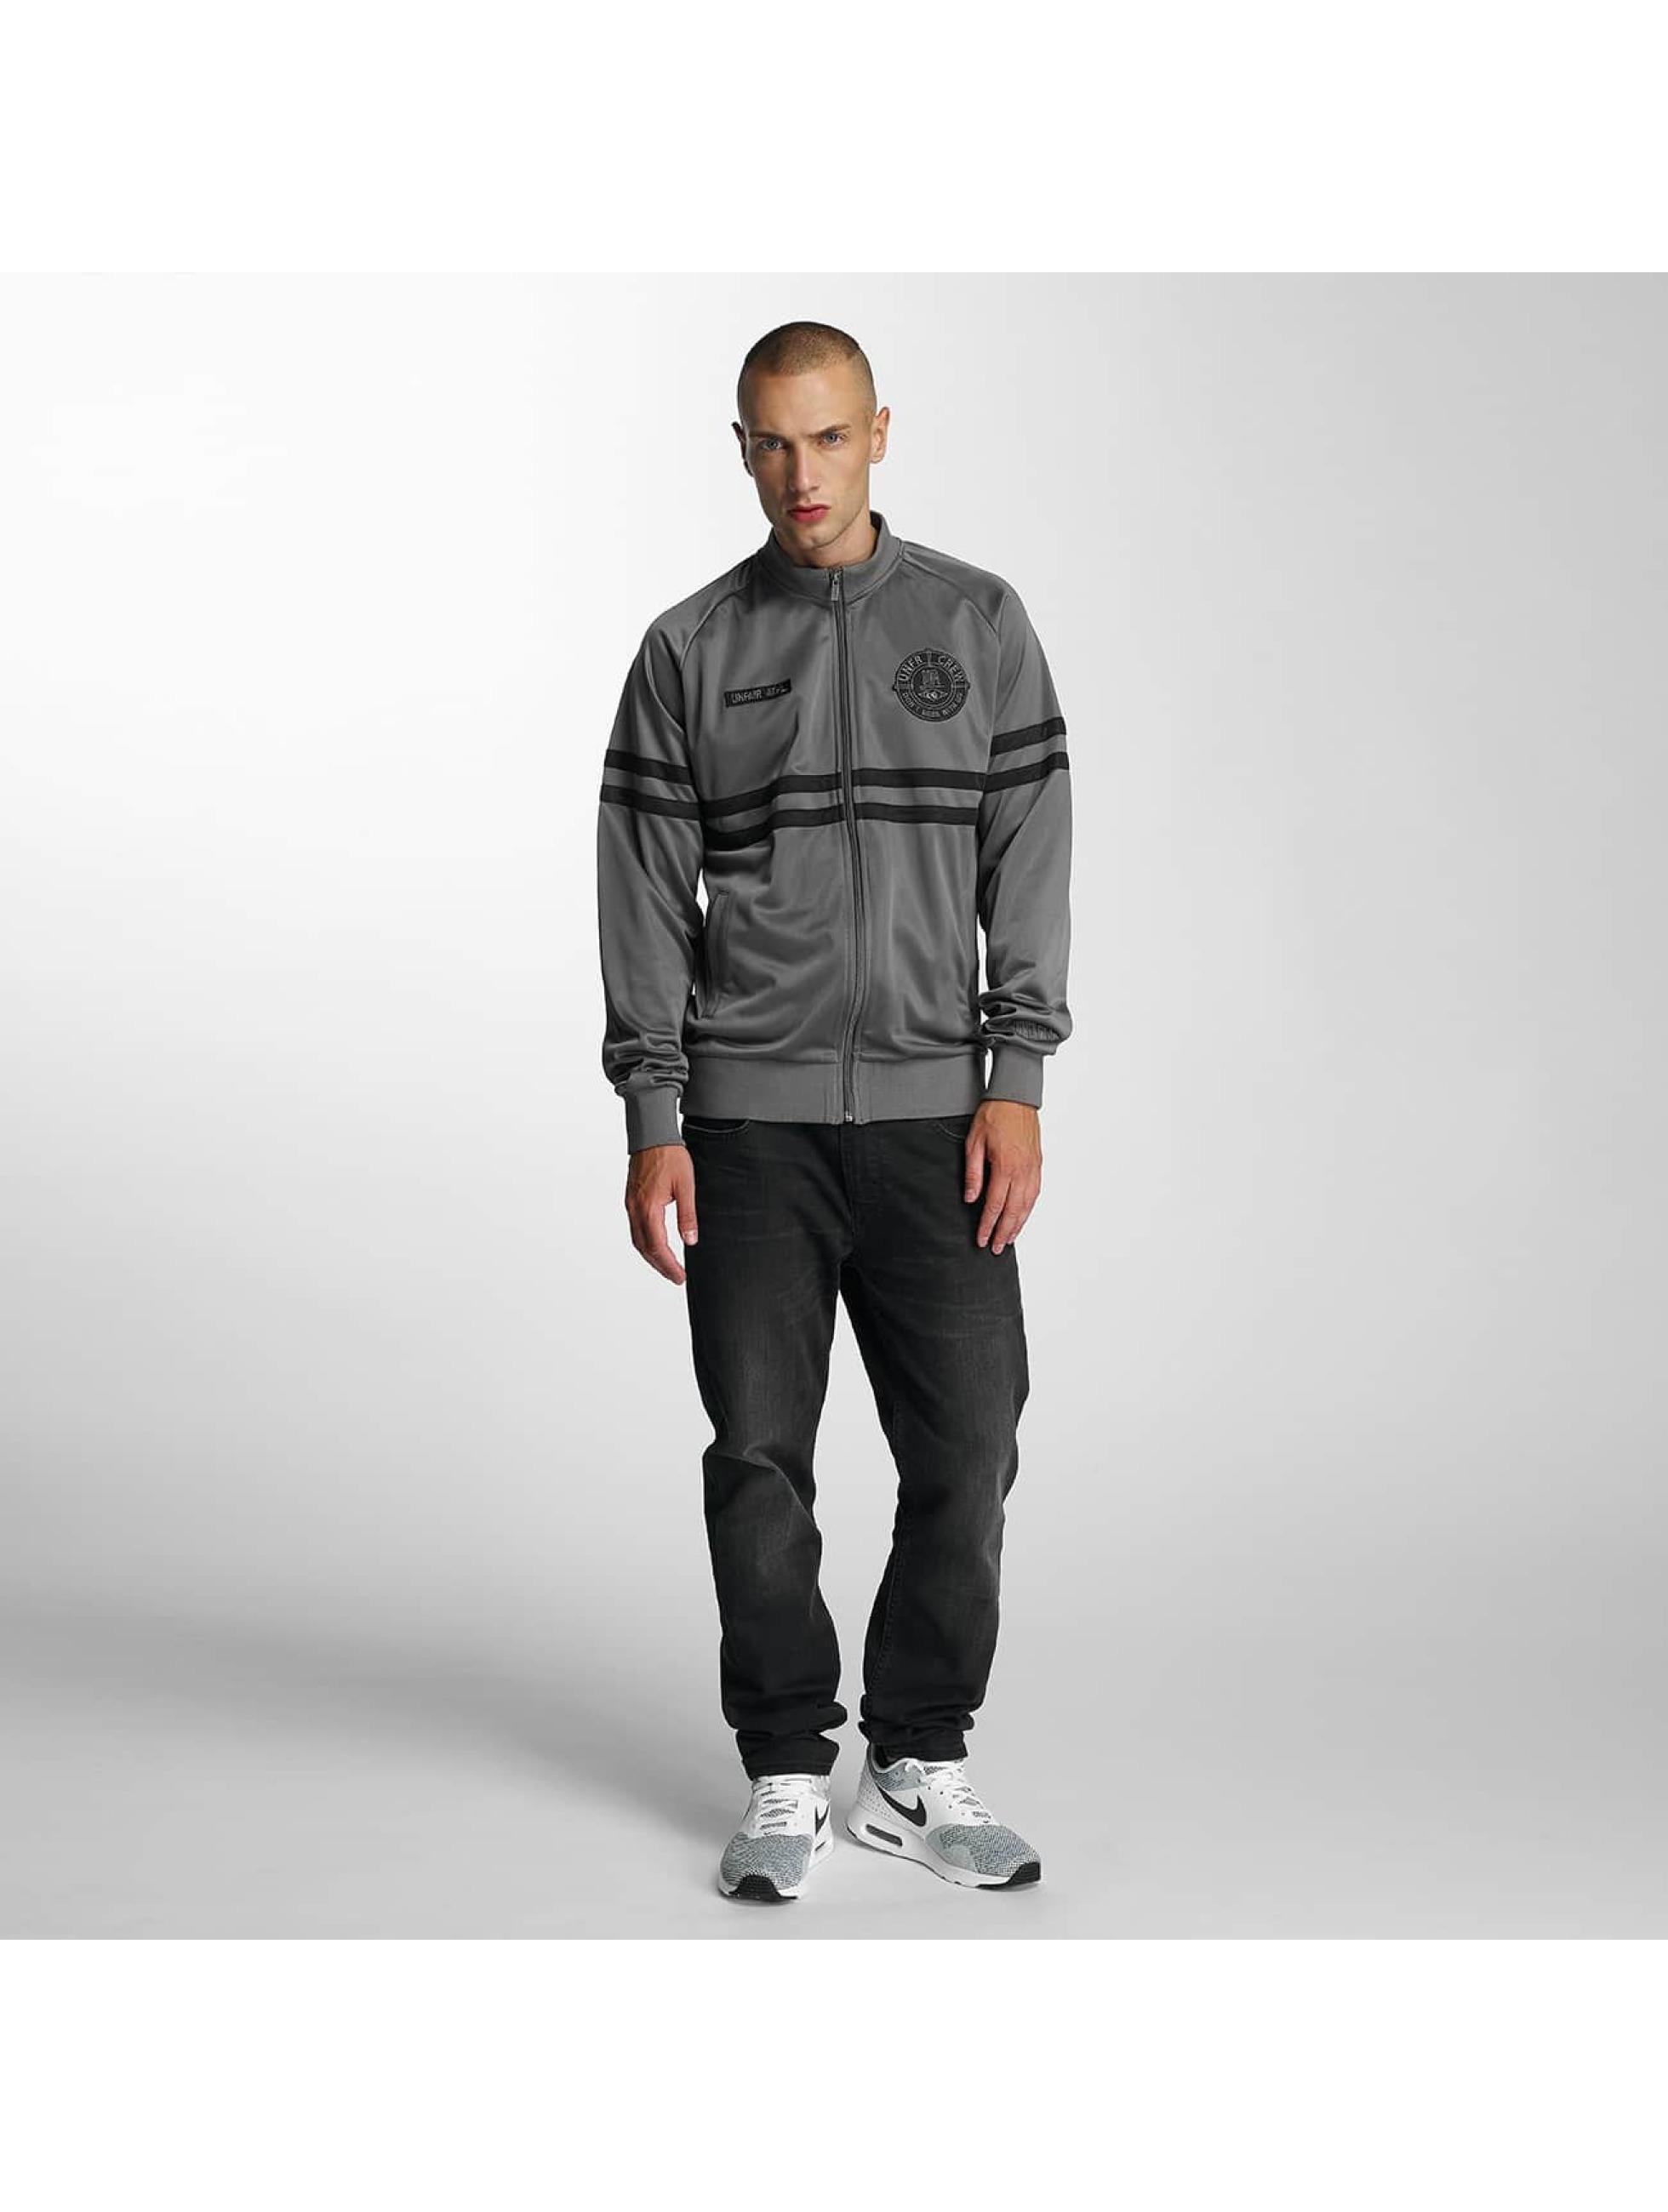 UNFAIR ATHLETICS Lightweight Jacket DMWU gray